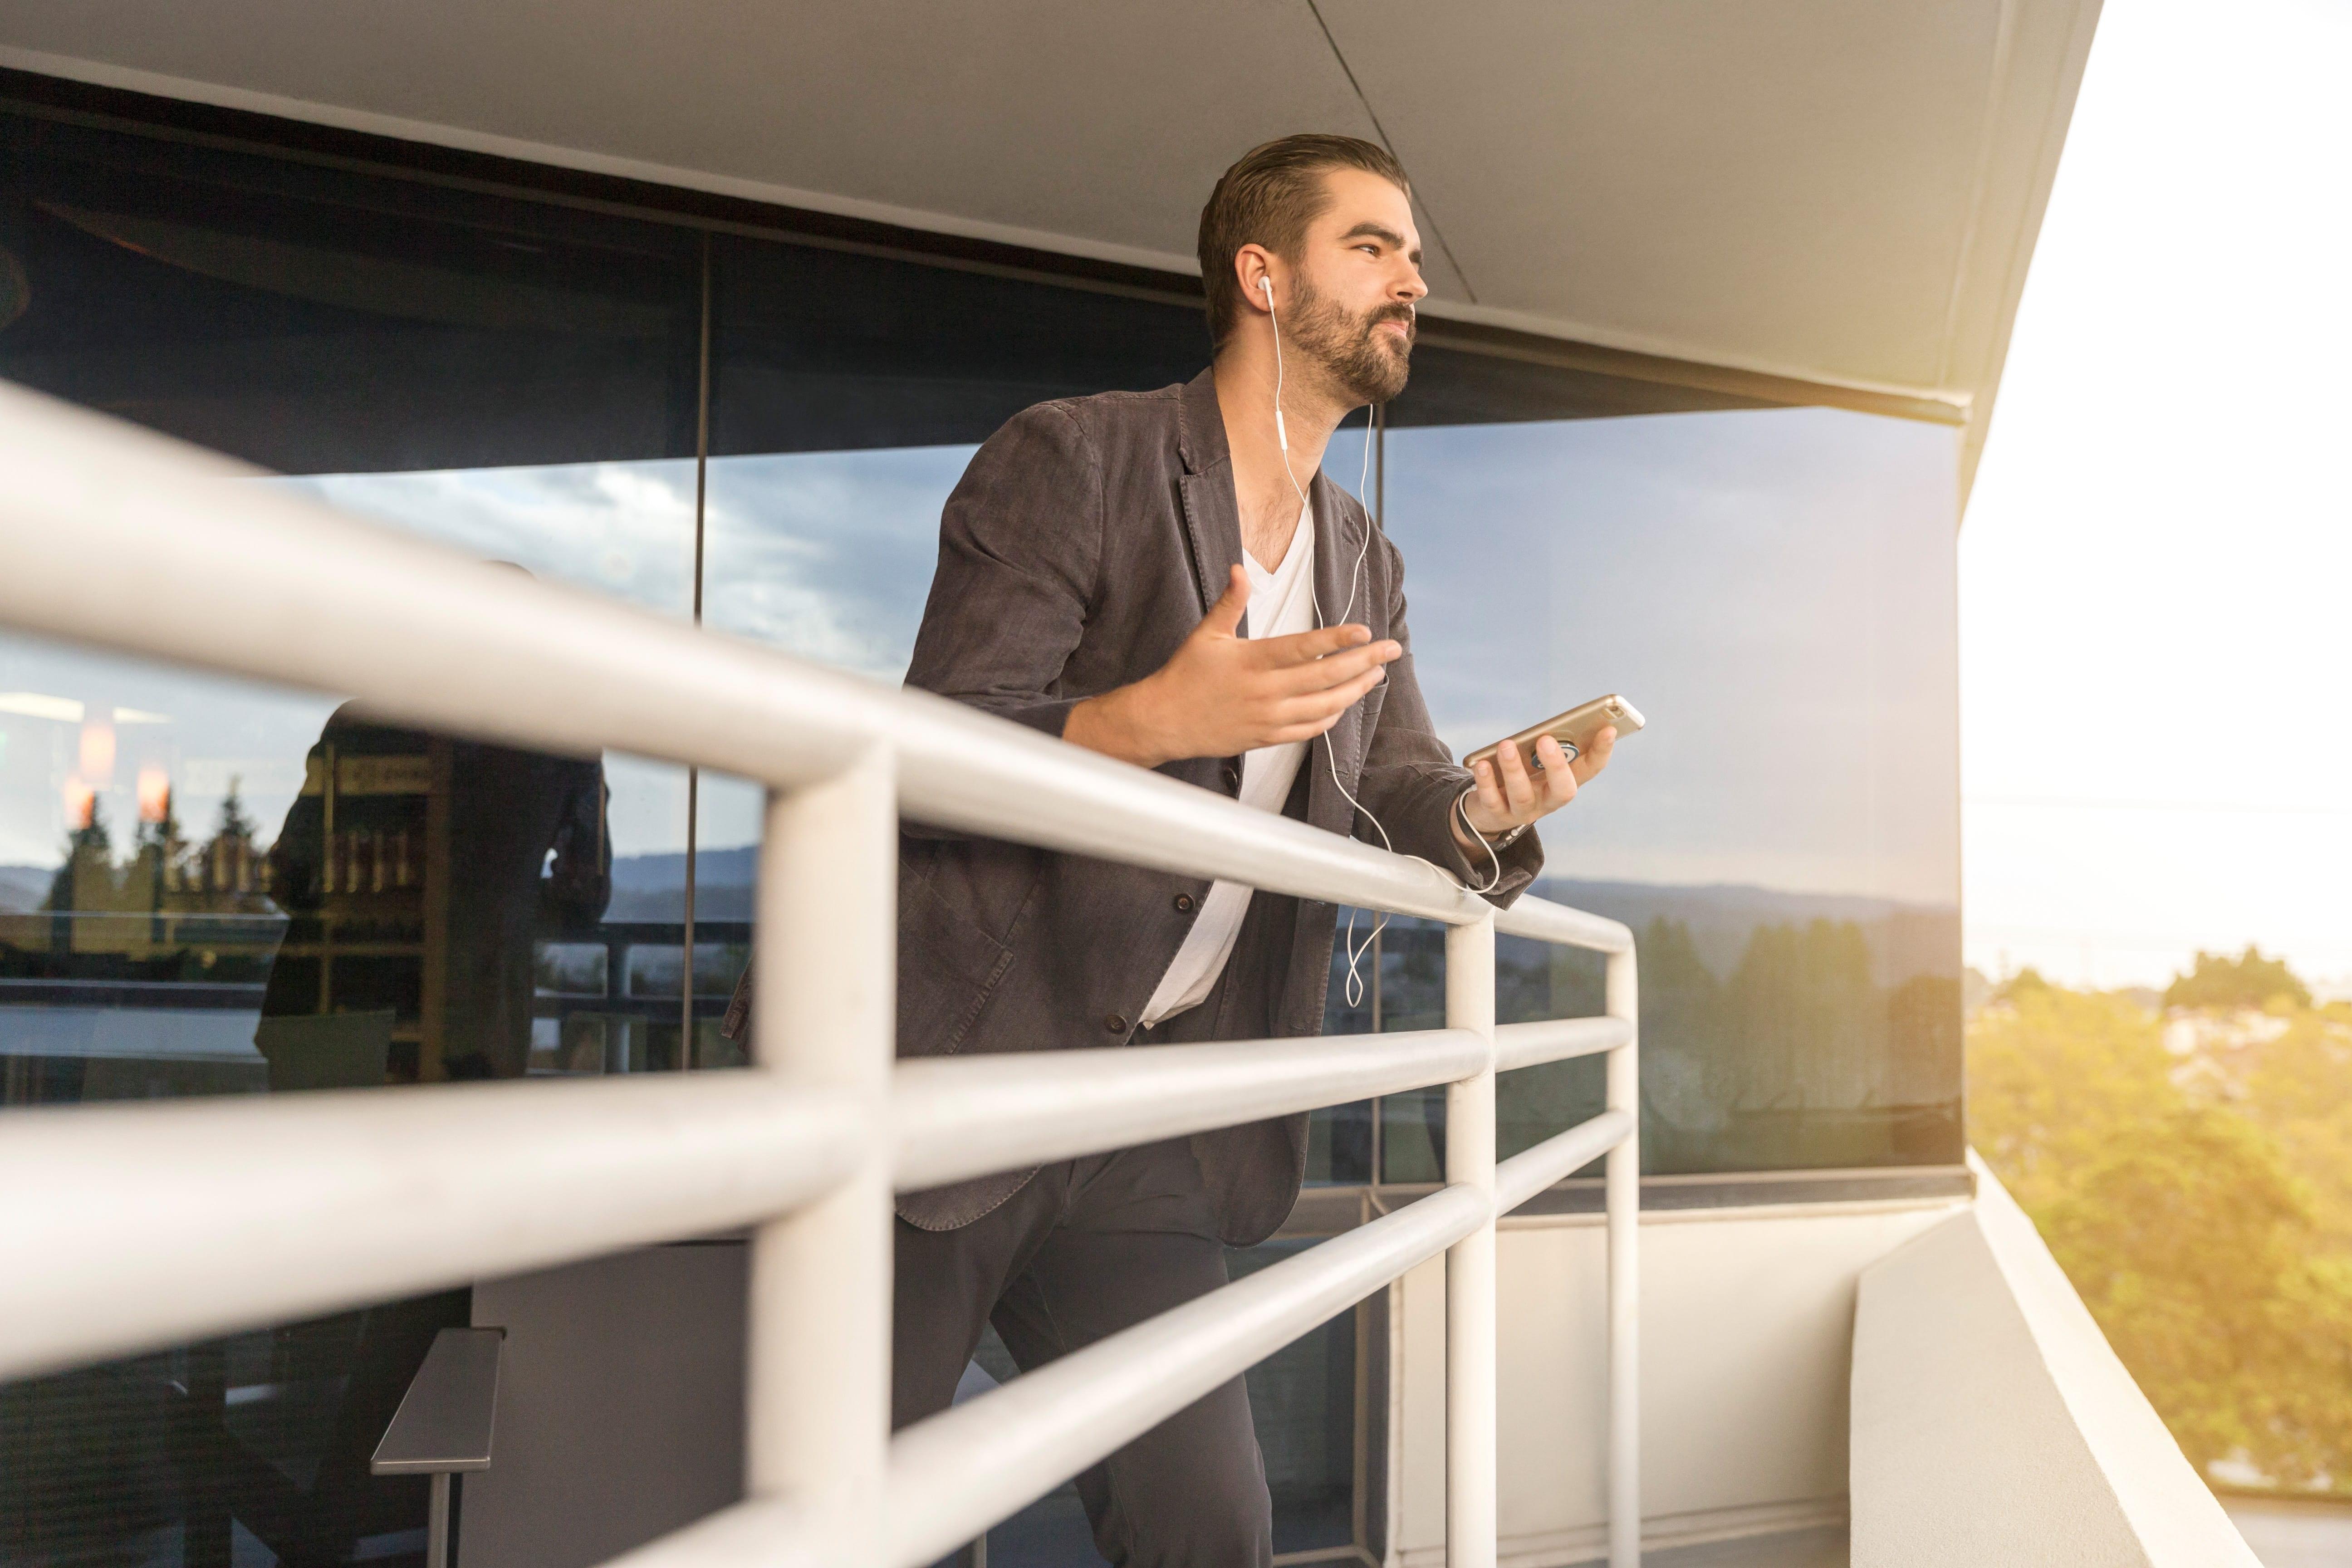 Man leaning on white metal rail; image by LinkedIn Sales Navigator, via Unsplash.com.